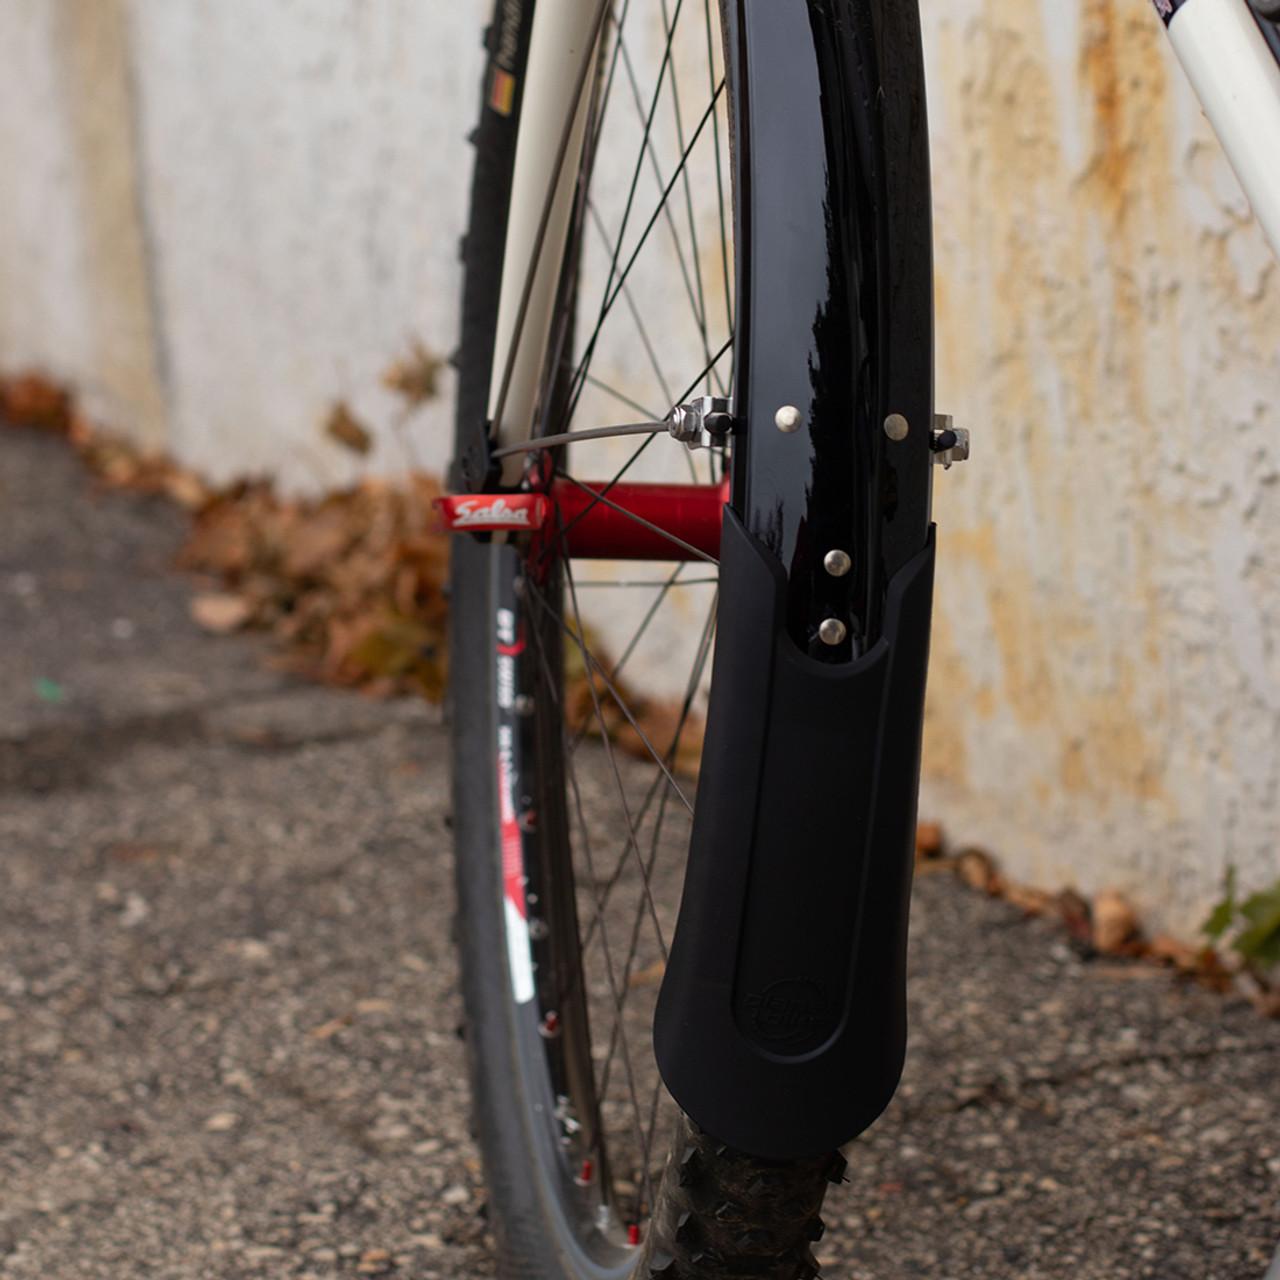 Planet Bike Cascadia bike fenders black 26 x 60mm 7057-5